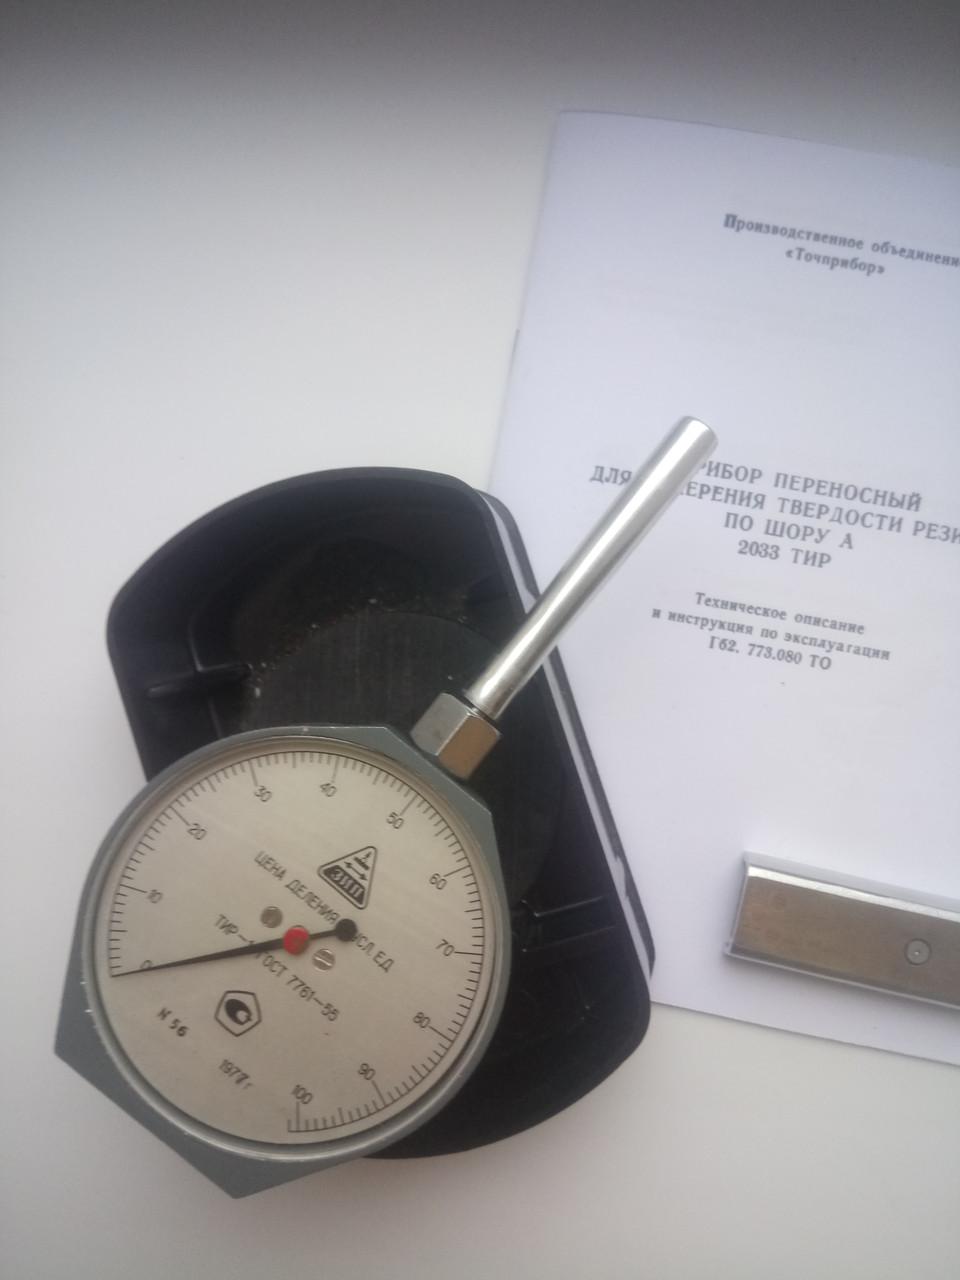 Твердомер по Шору ТИР1 (аналог) ТИР2033 возможна калибровка УкрЦСМ